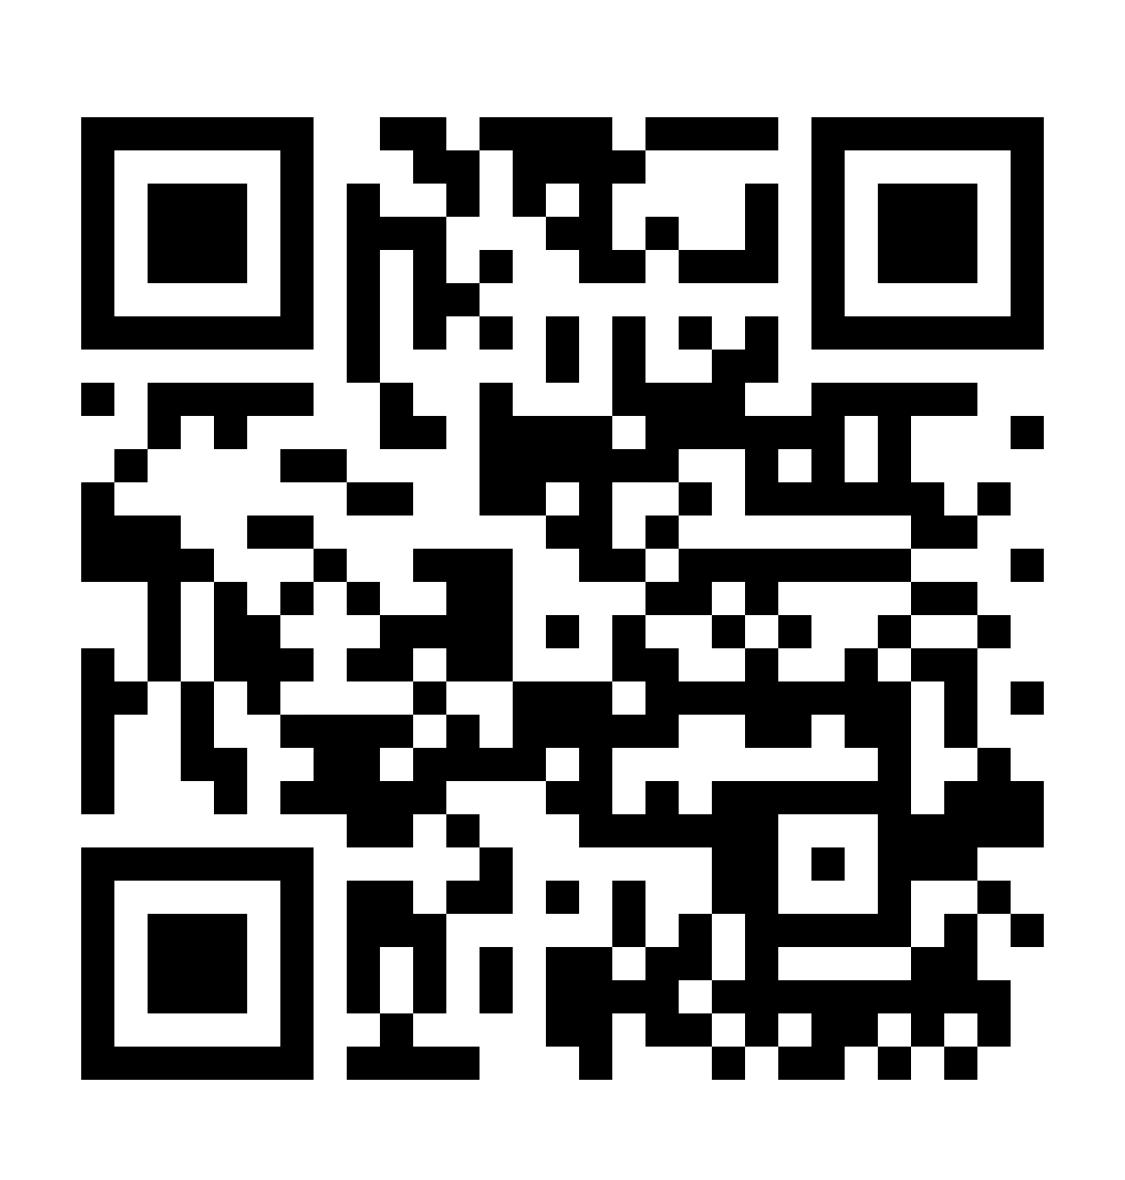 https://firebasestorage.googleapis.com/v0/b/phonesites-prod.appspot.com/o/images%2F6ugtQhaTEIQHK1cg4kGzlb0iS513%2F1612410154440*6B6F5A6D-D643-48EB-BA3E-B1BDD8A20CD7*jpeg?alt=media&token=8d0d643c-c9fa-4319-bc4b-e358c663ede5